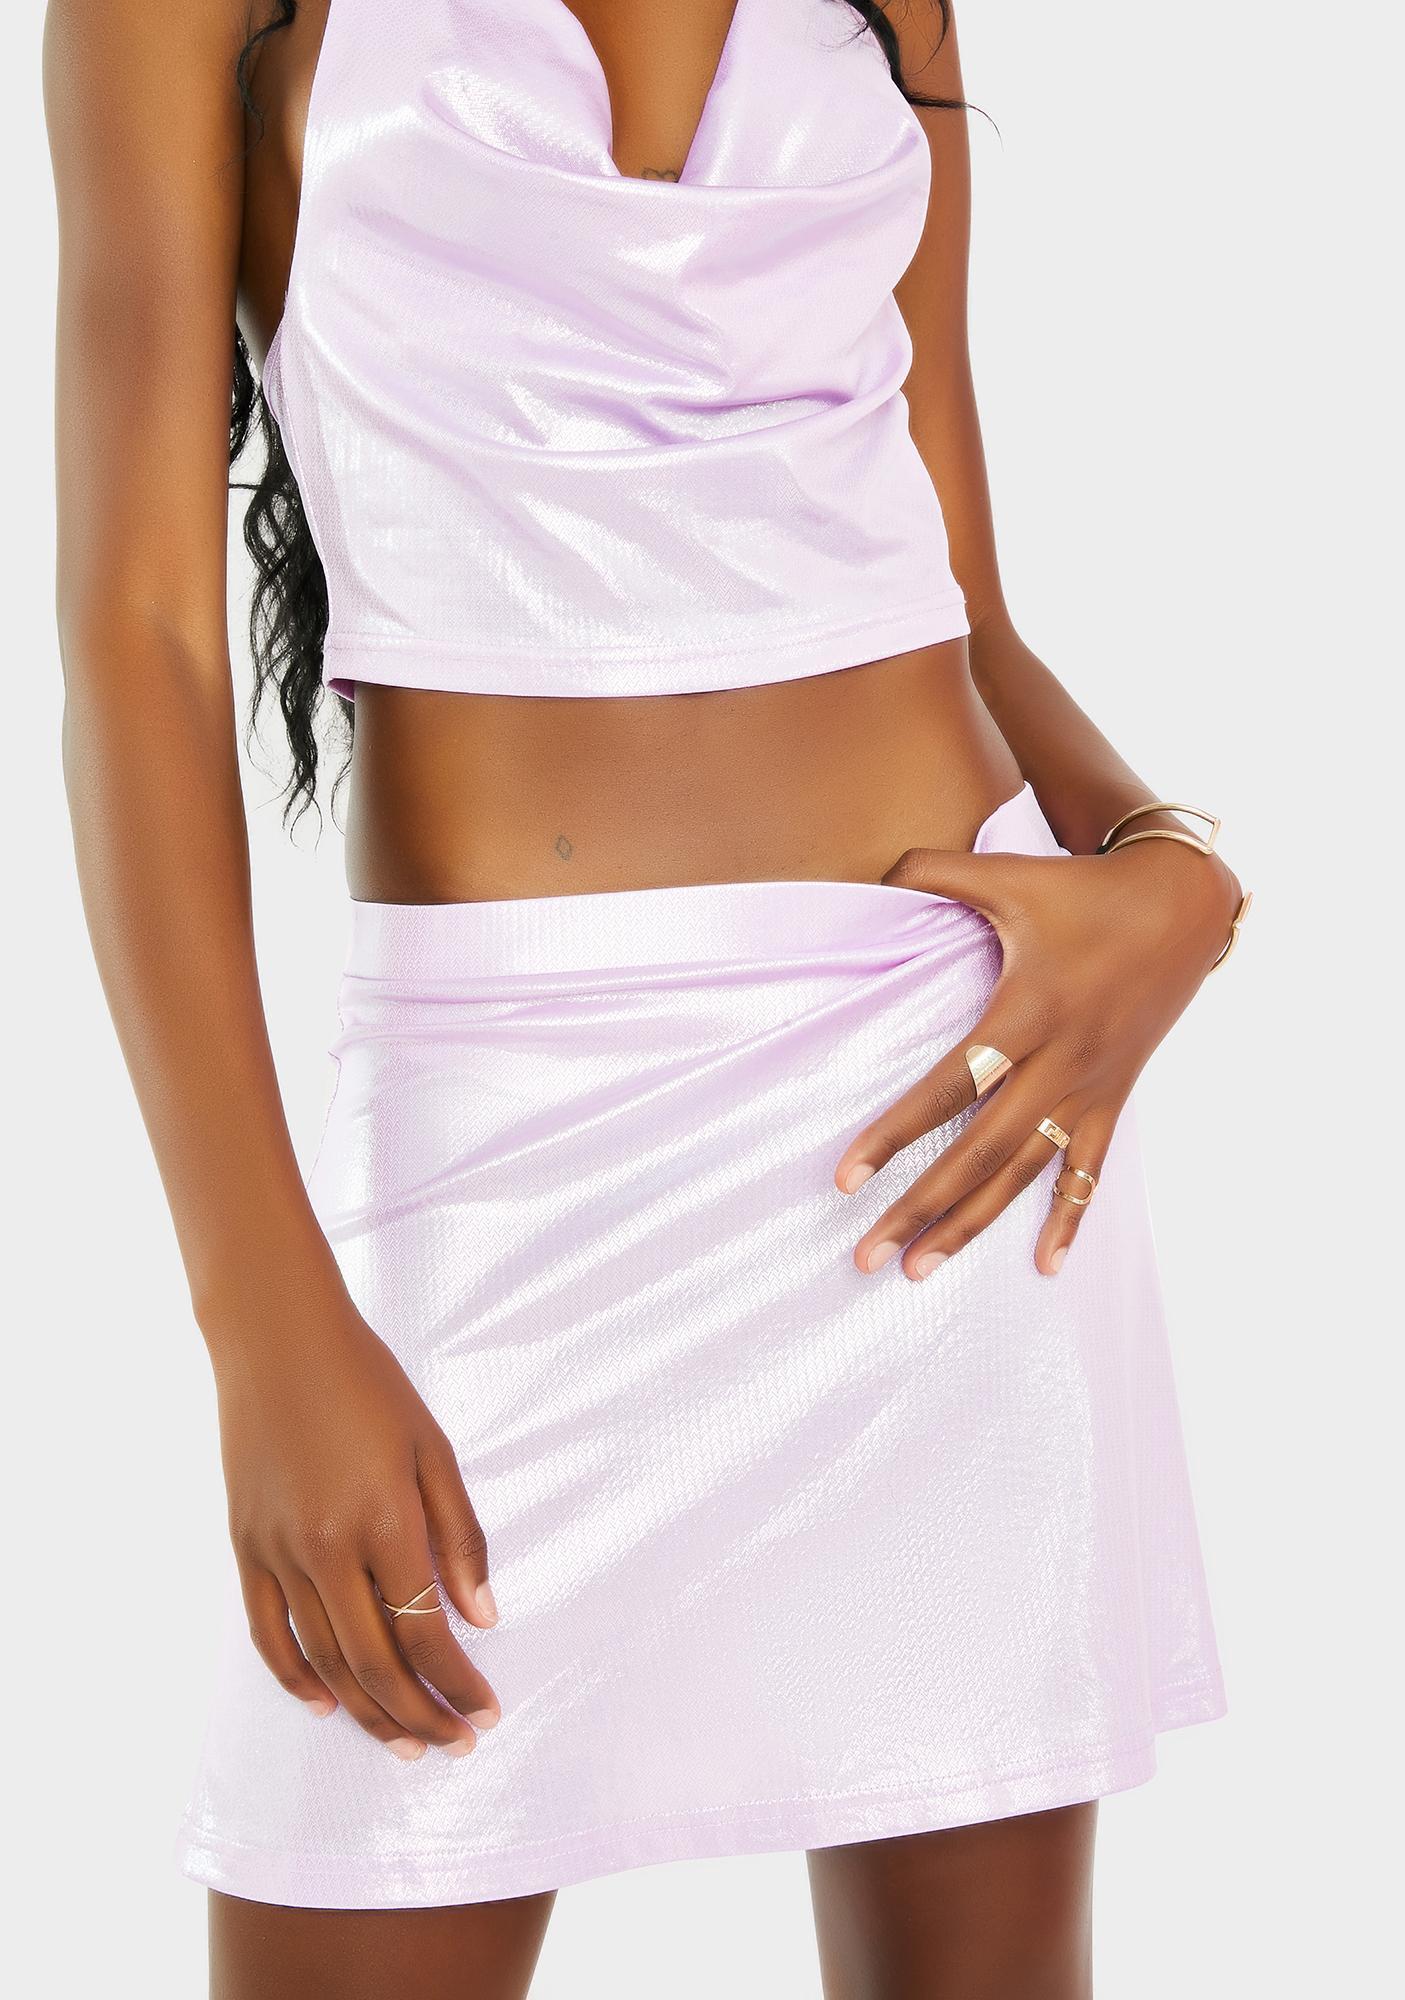 Elsie & Fred Fastlove Lime Lame A-Line Skirt